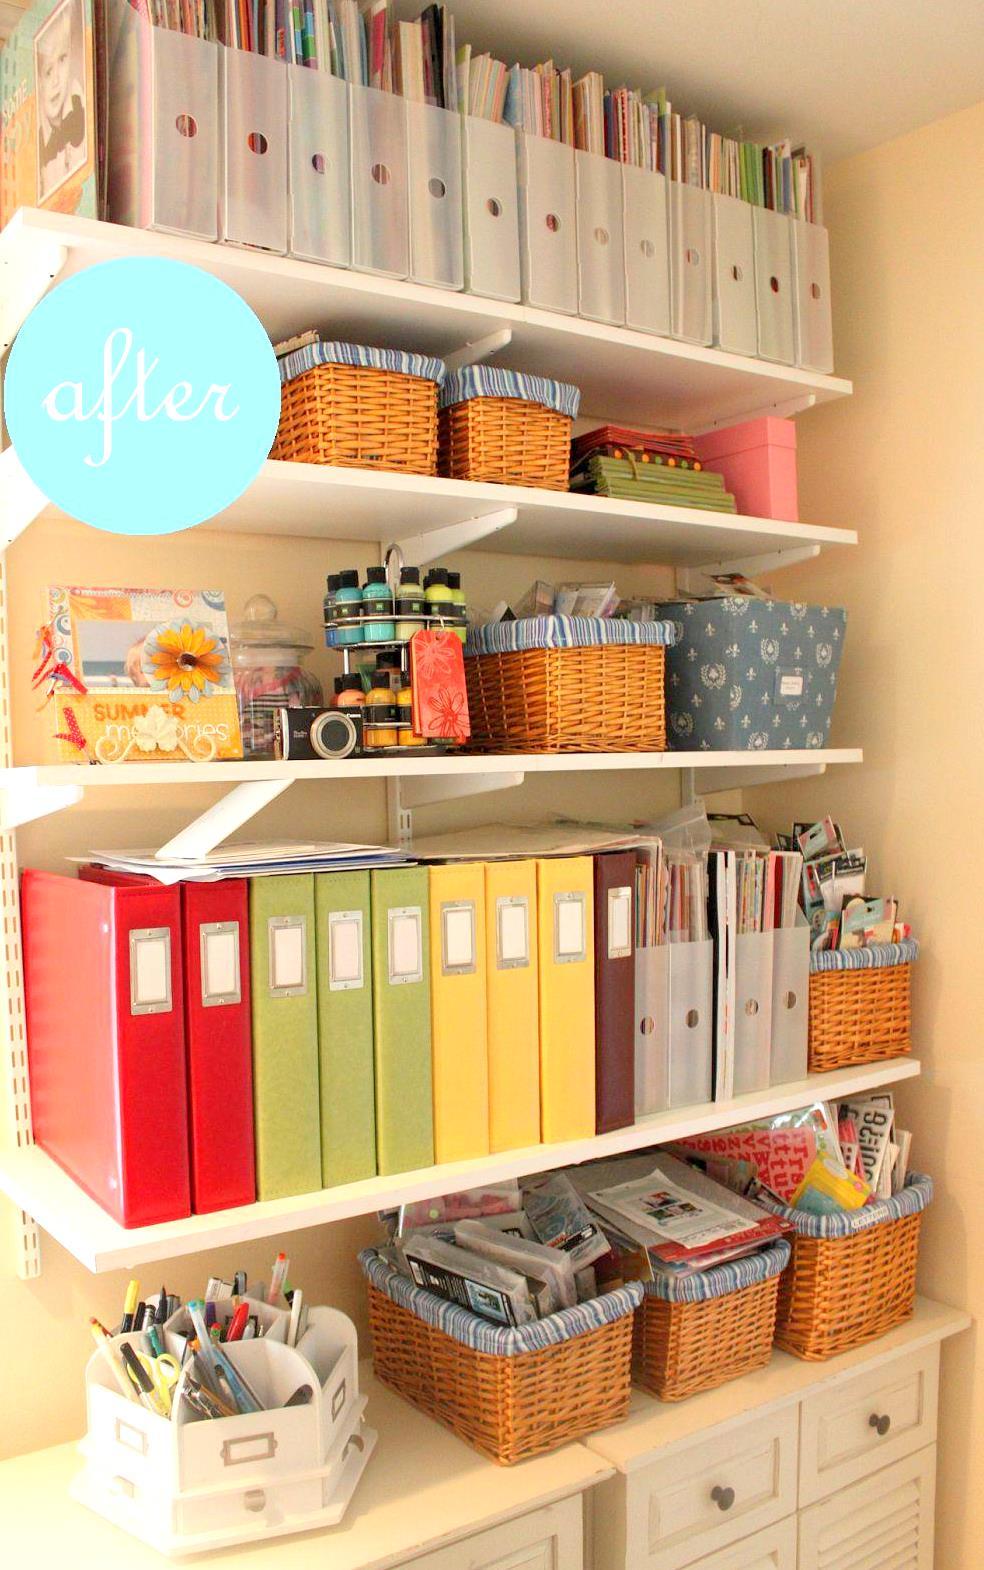 deliciously organized: Project: Office Organization - Office Organization Ideas